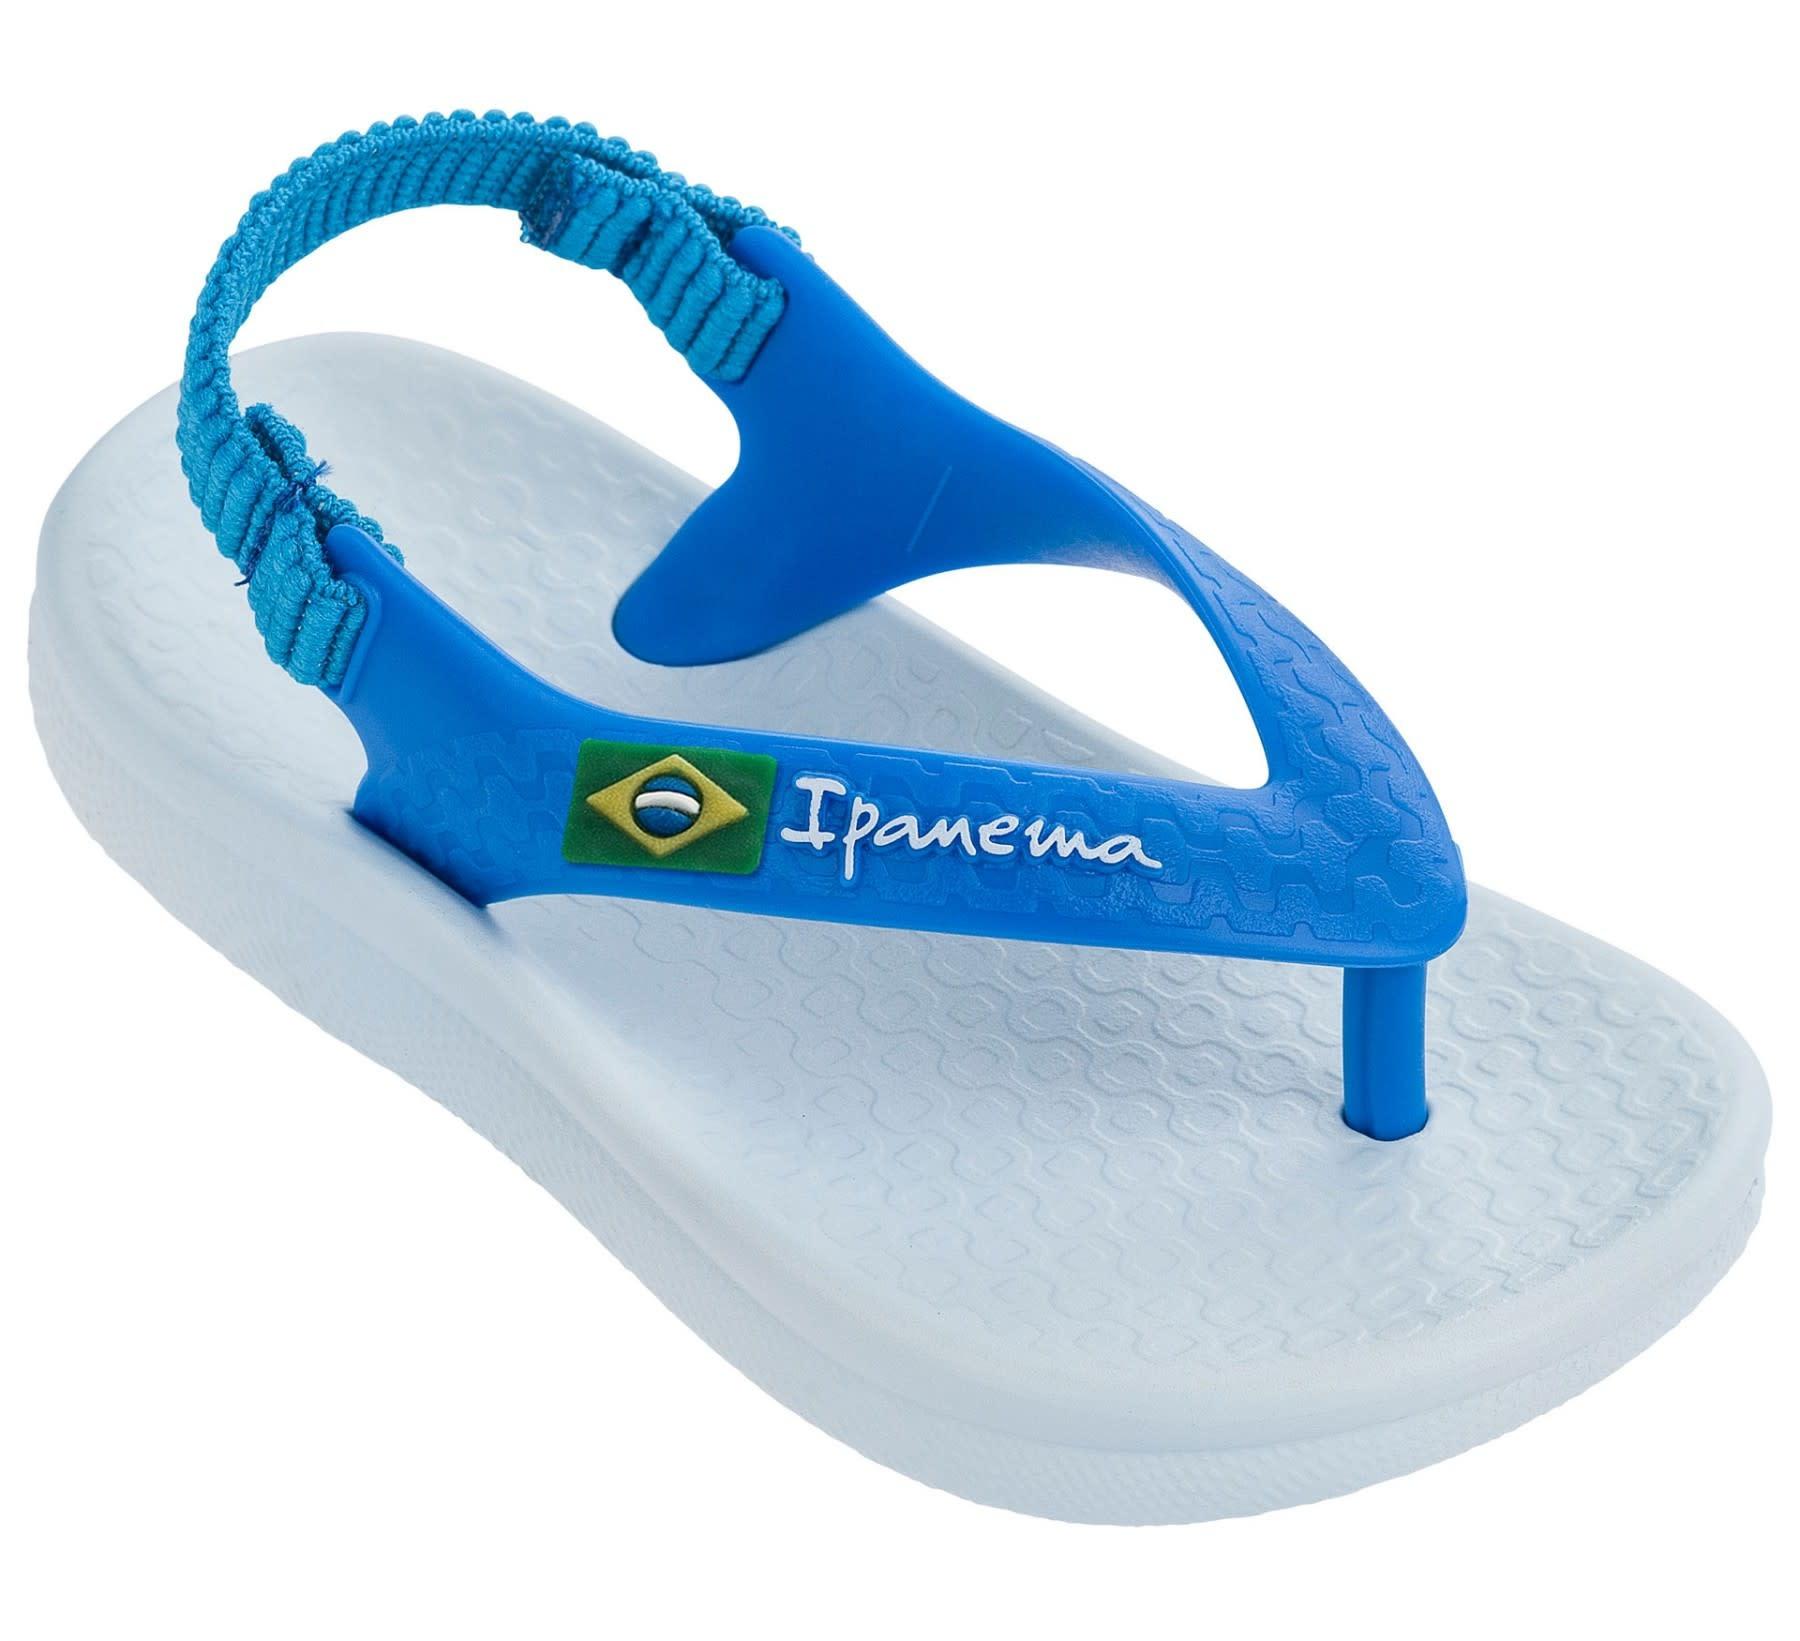 Ipanema Ipanema anatomica soft baby blue